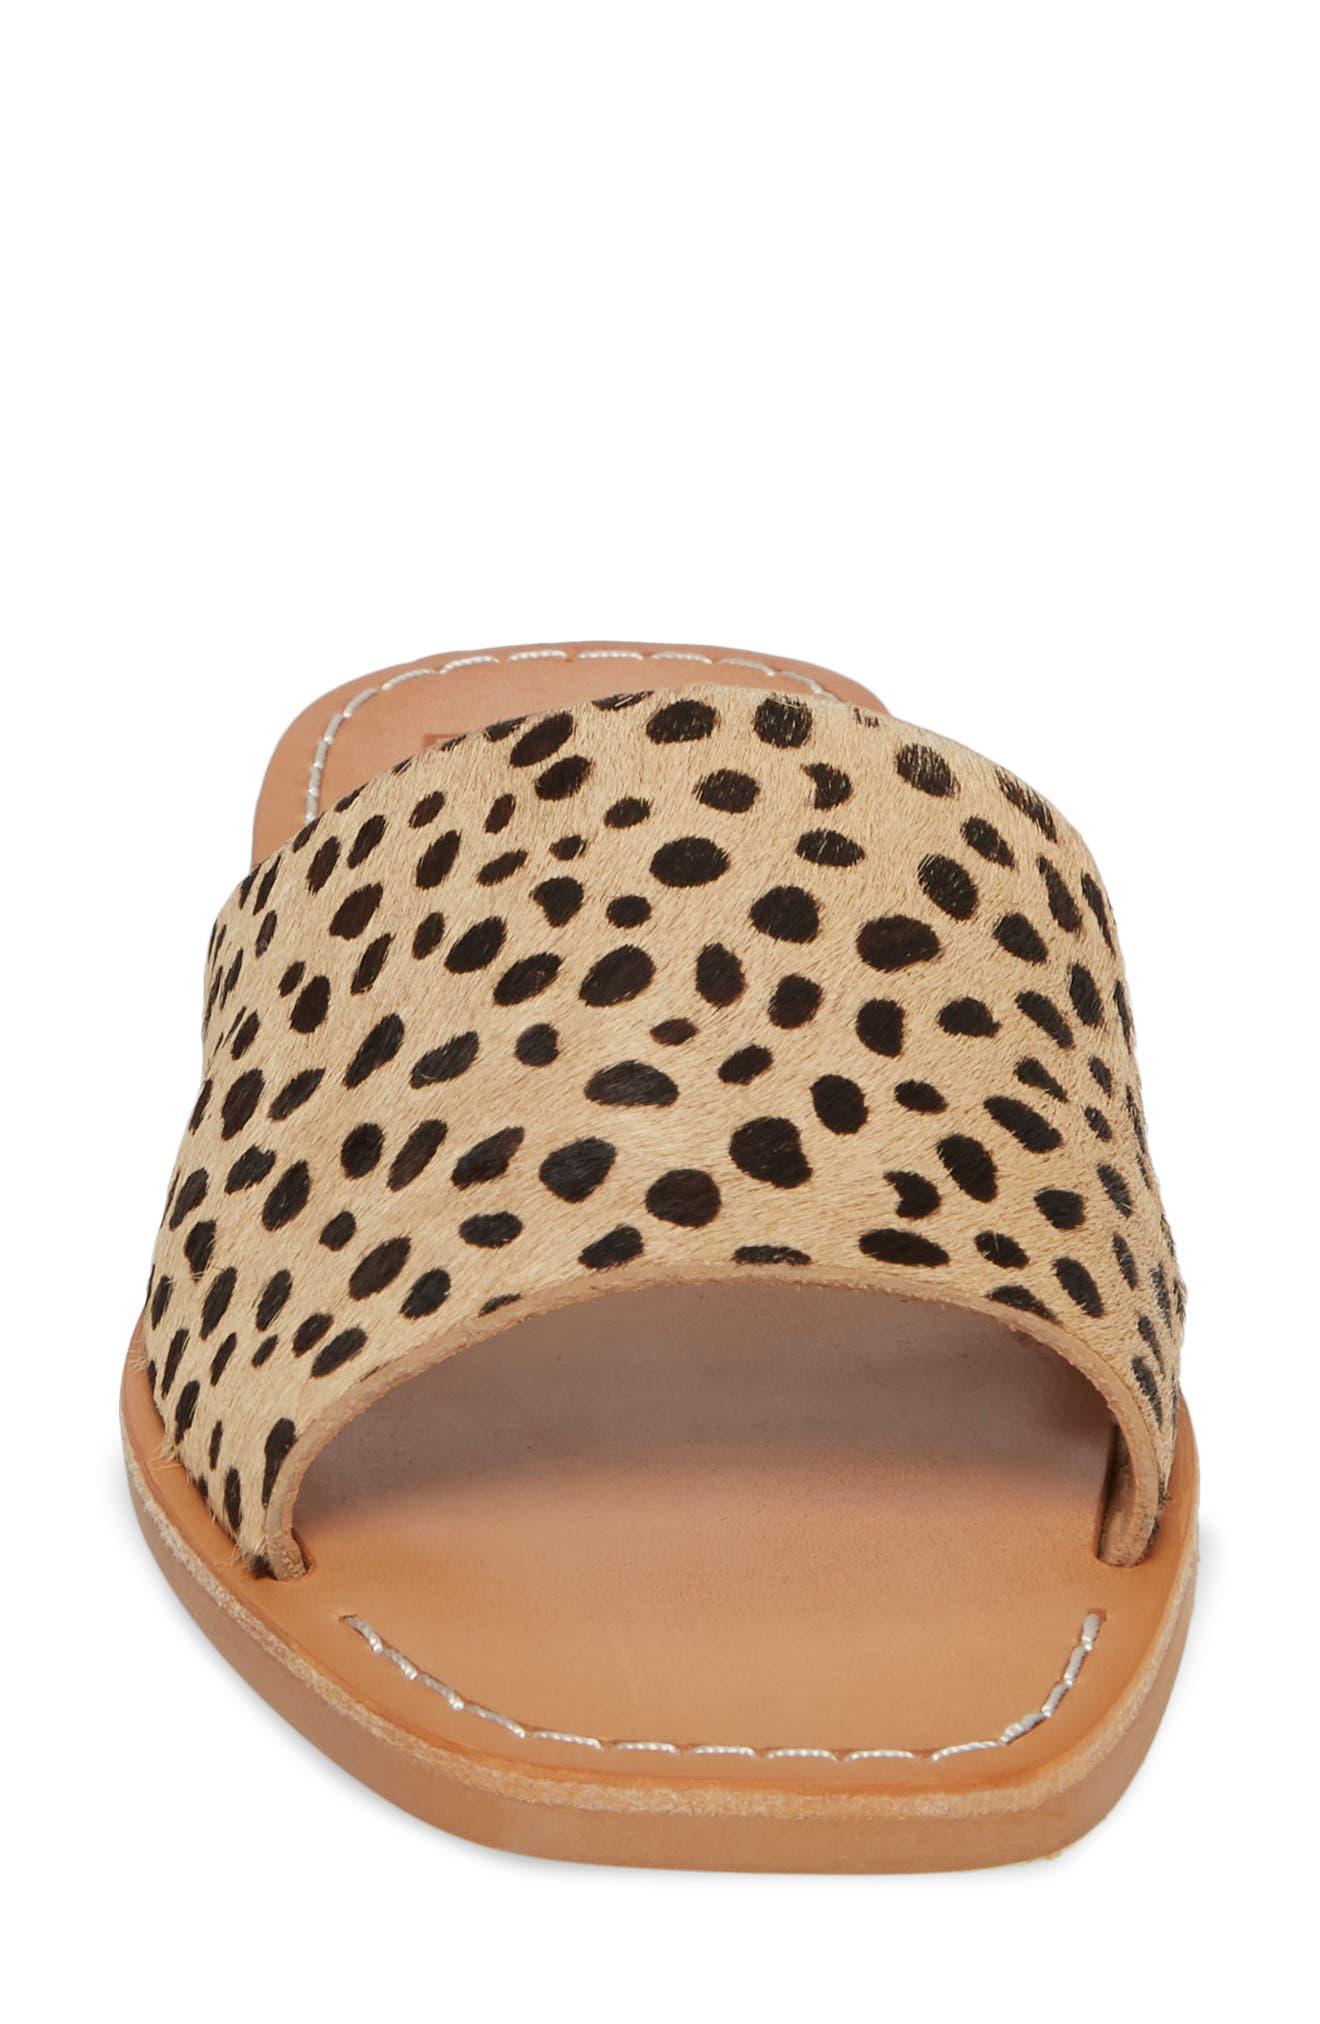 Cato Genuine Calf Hair Slide Sandal,                             Alternate thumbnail 4, color,                             Leopard Calf Hair